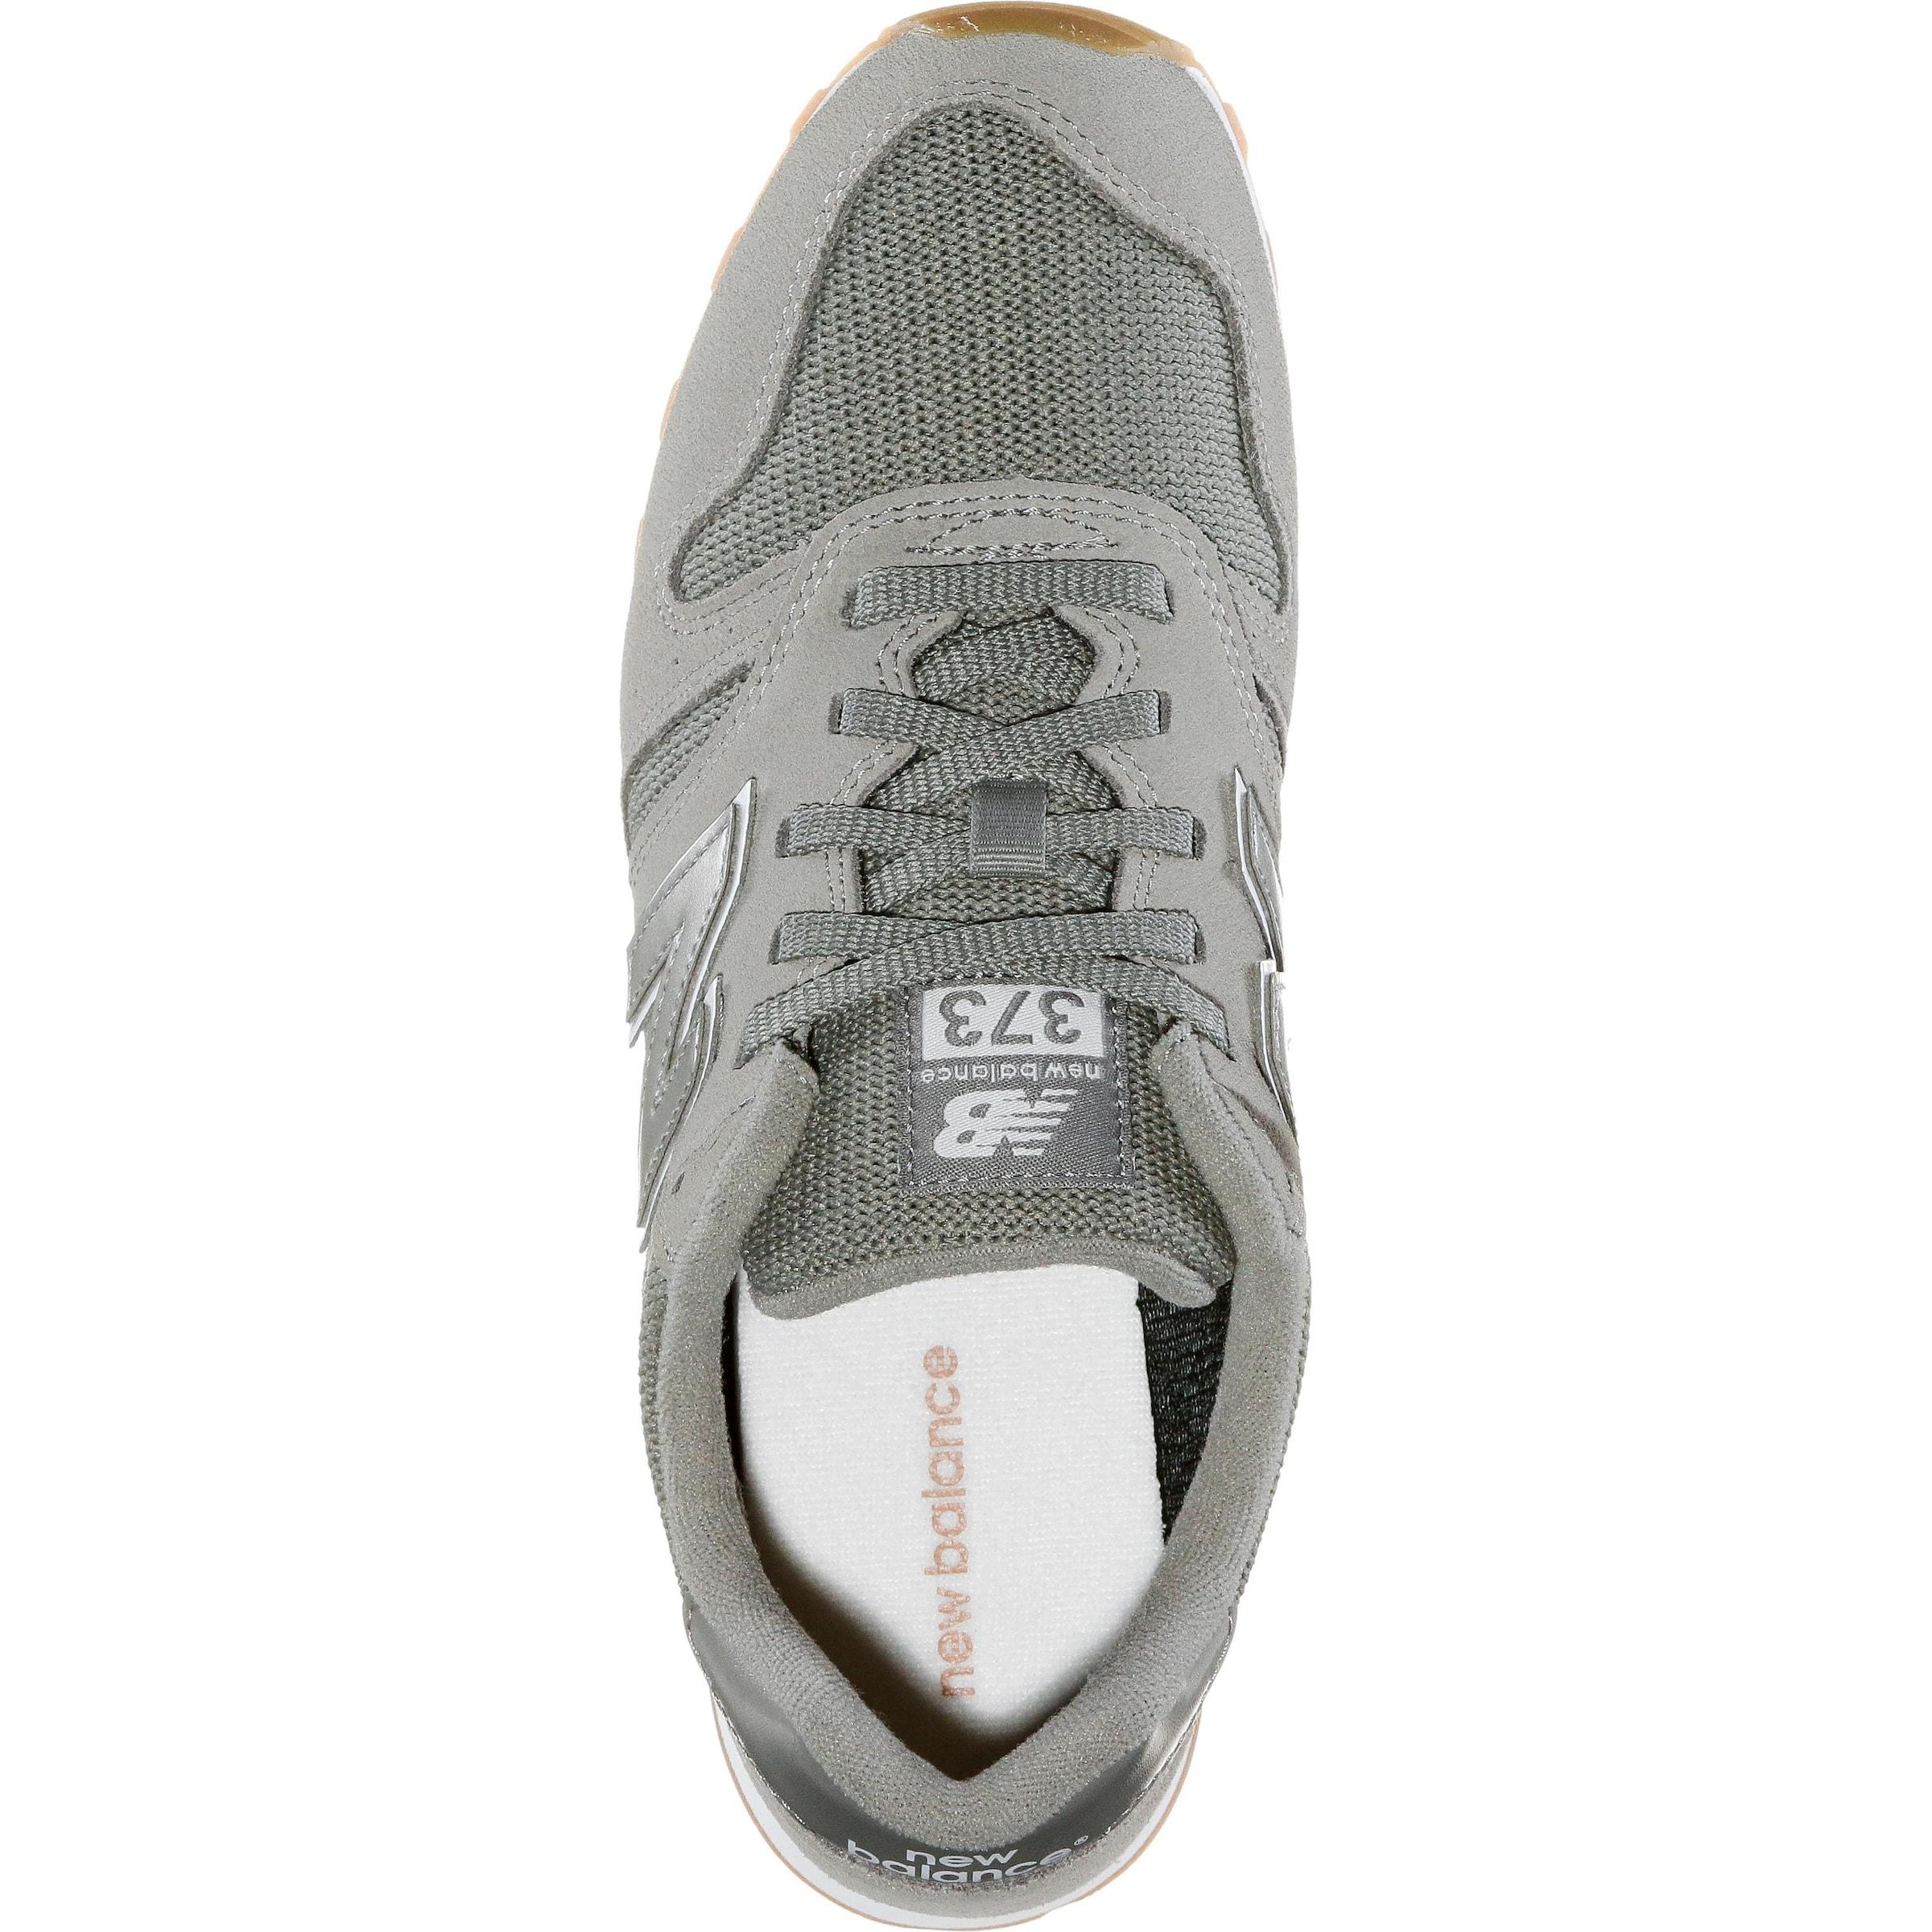 Weiß GrauTaupe In New Sneaker 373 Wl Balance nm8vO0wN